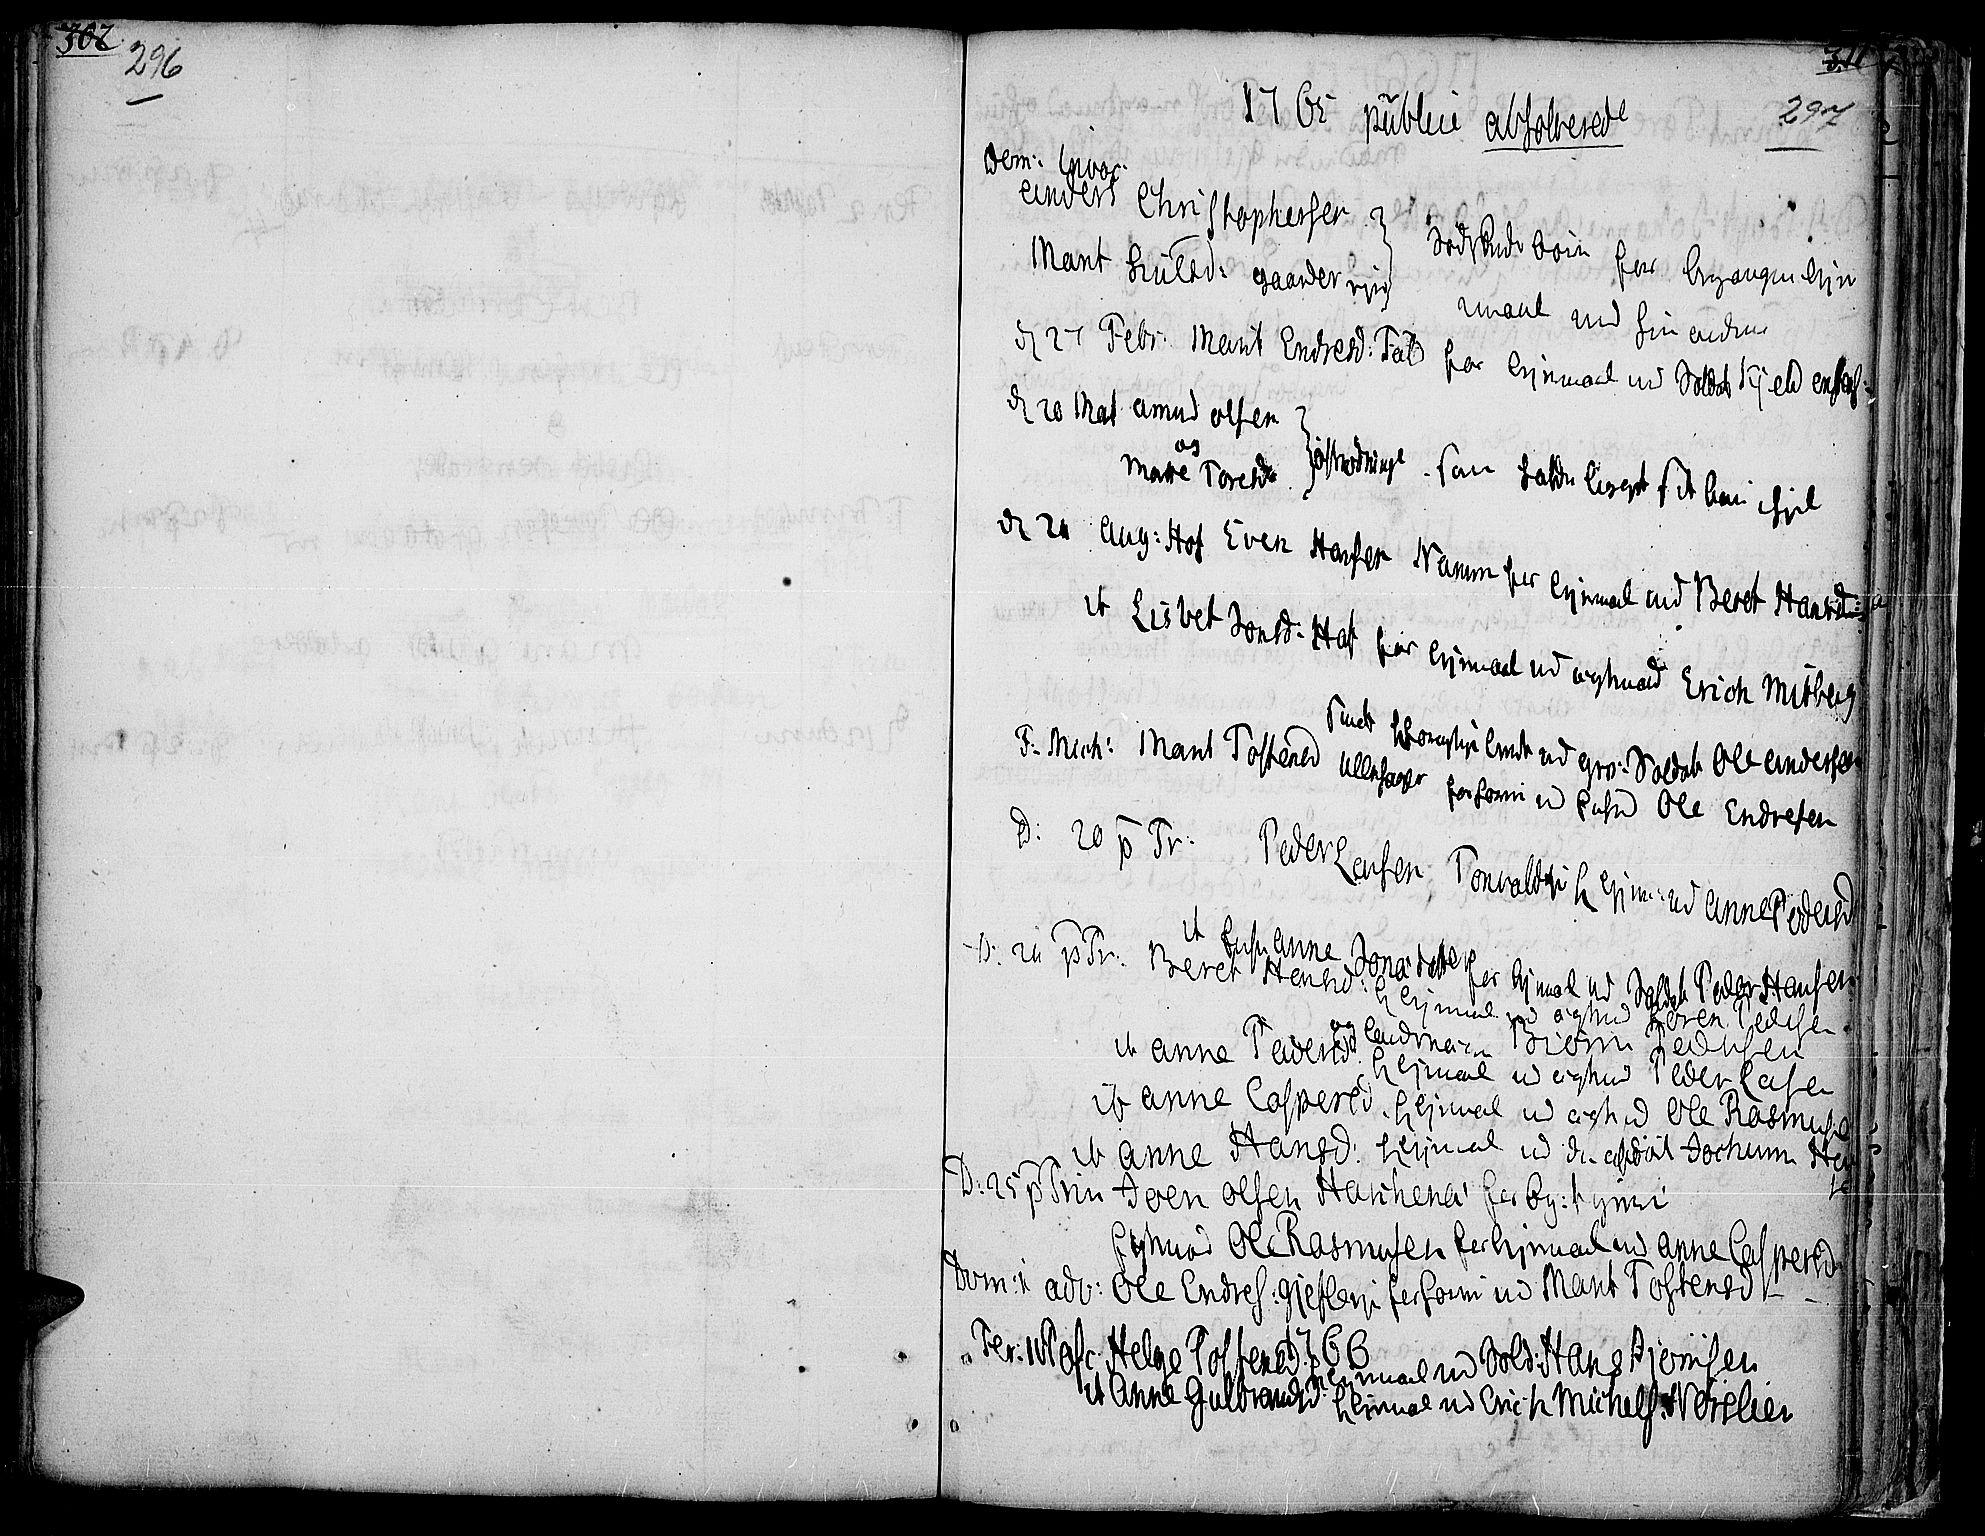 SAH, Land prestekontor, Ministerialbok nr. 5, 1765-1784, s. 296-297